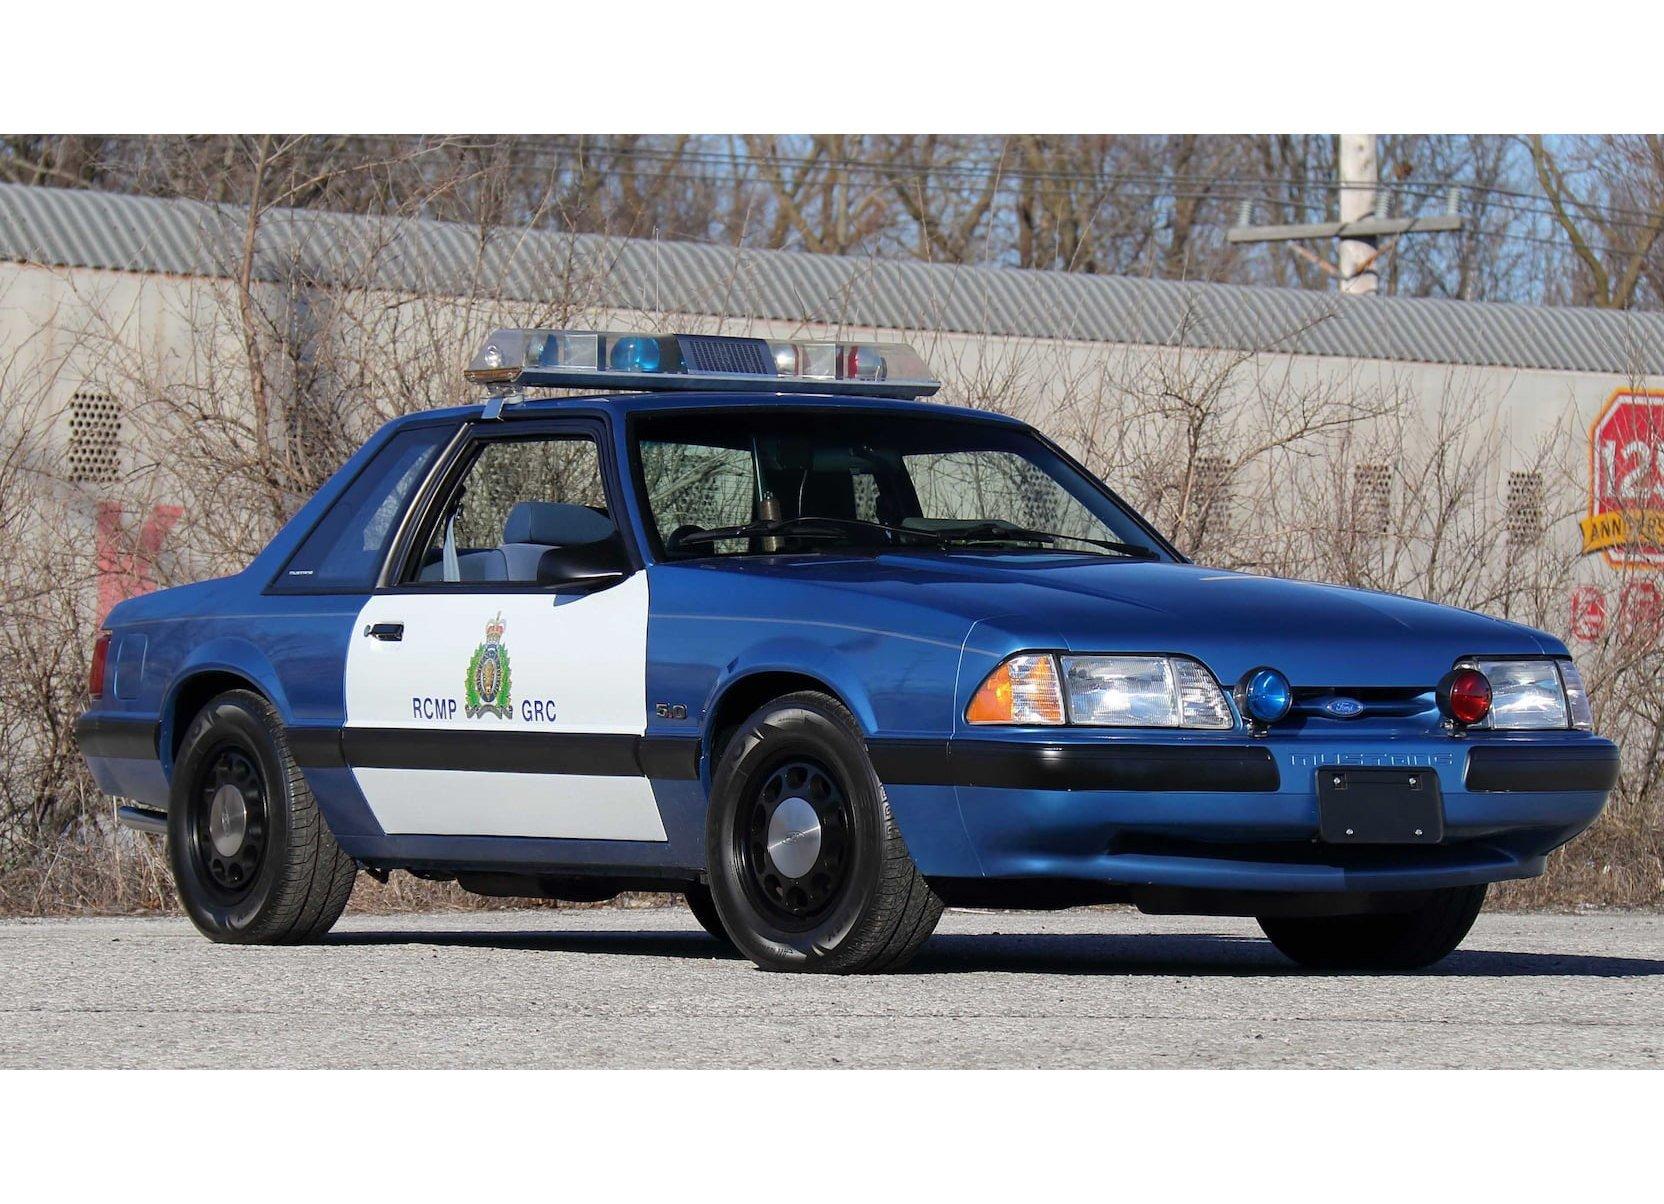 Royal Canadian Mounted Police Ford Mustang Patrol Car